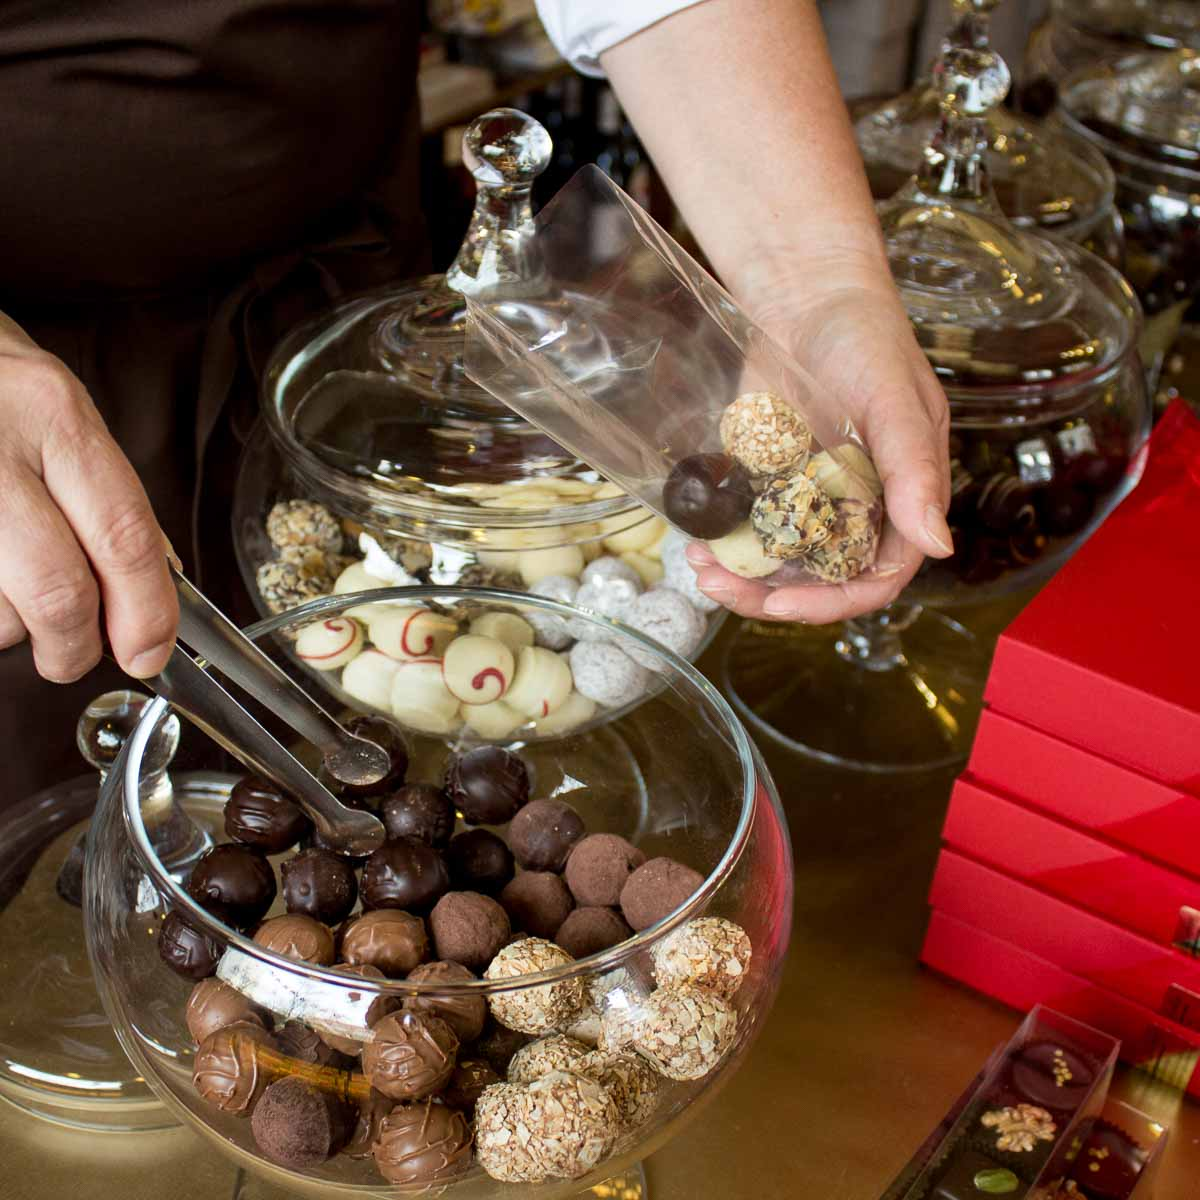 Das süße Leben Schokoladen & Pralinen in Berlin-Schöneberg-7